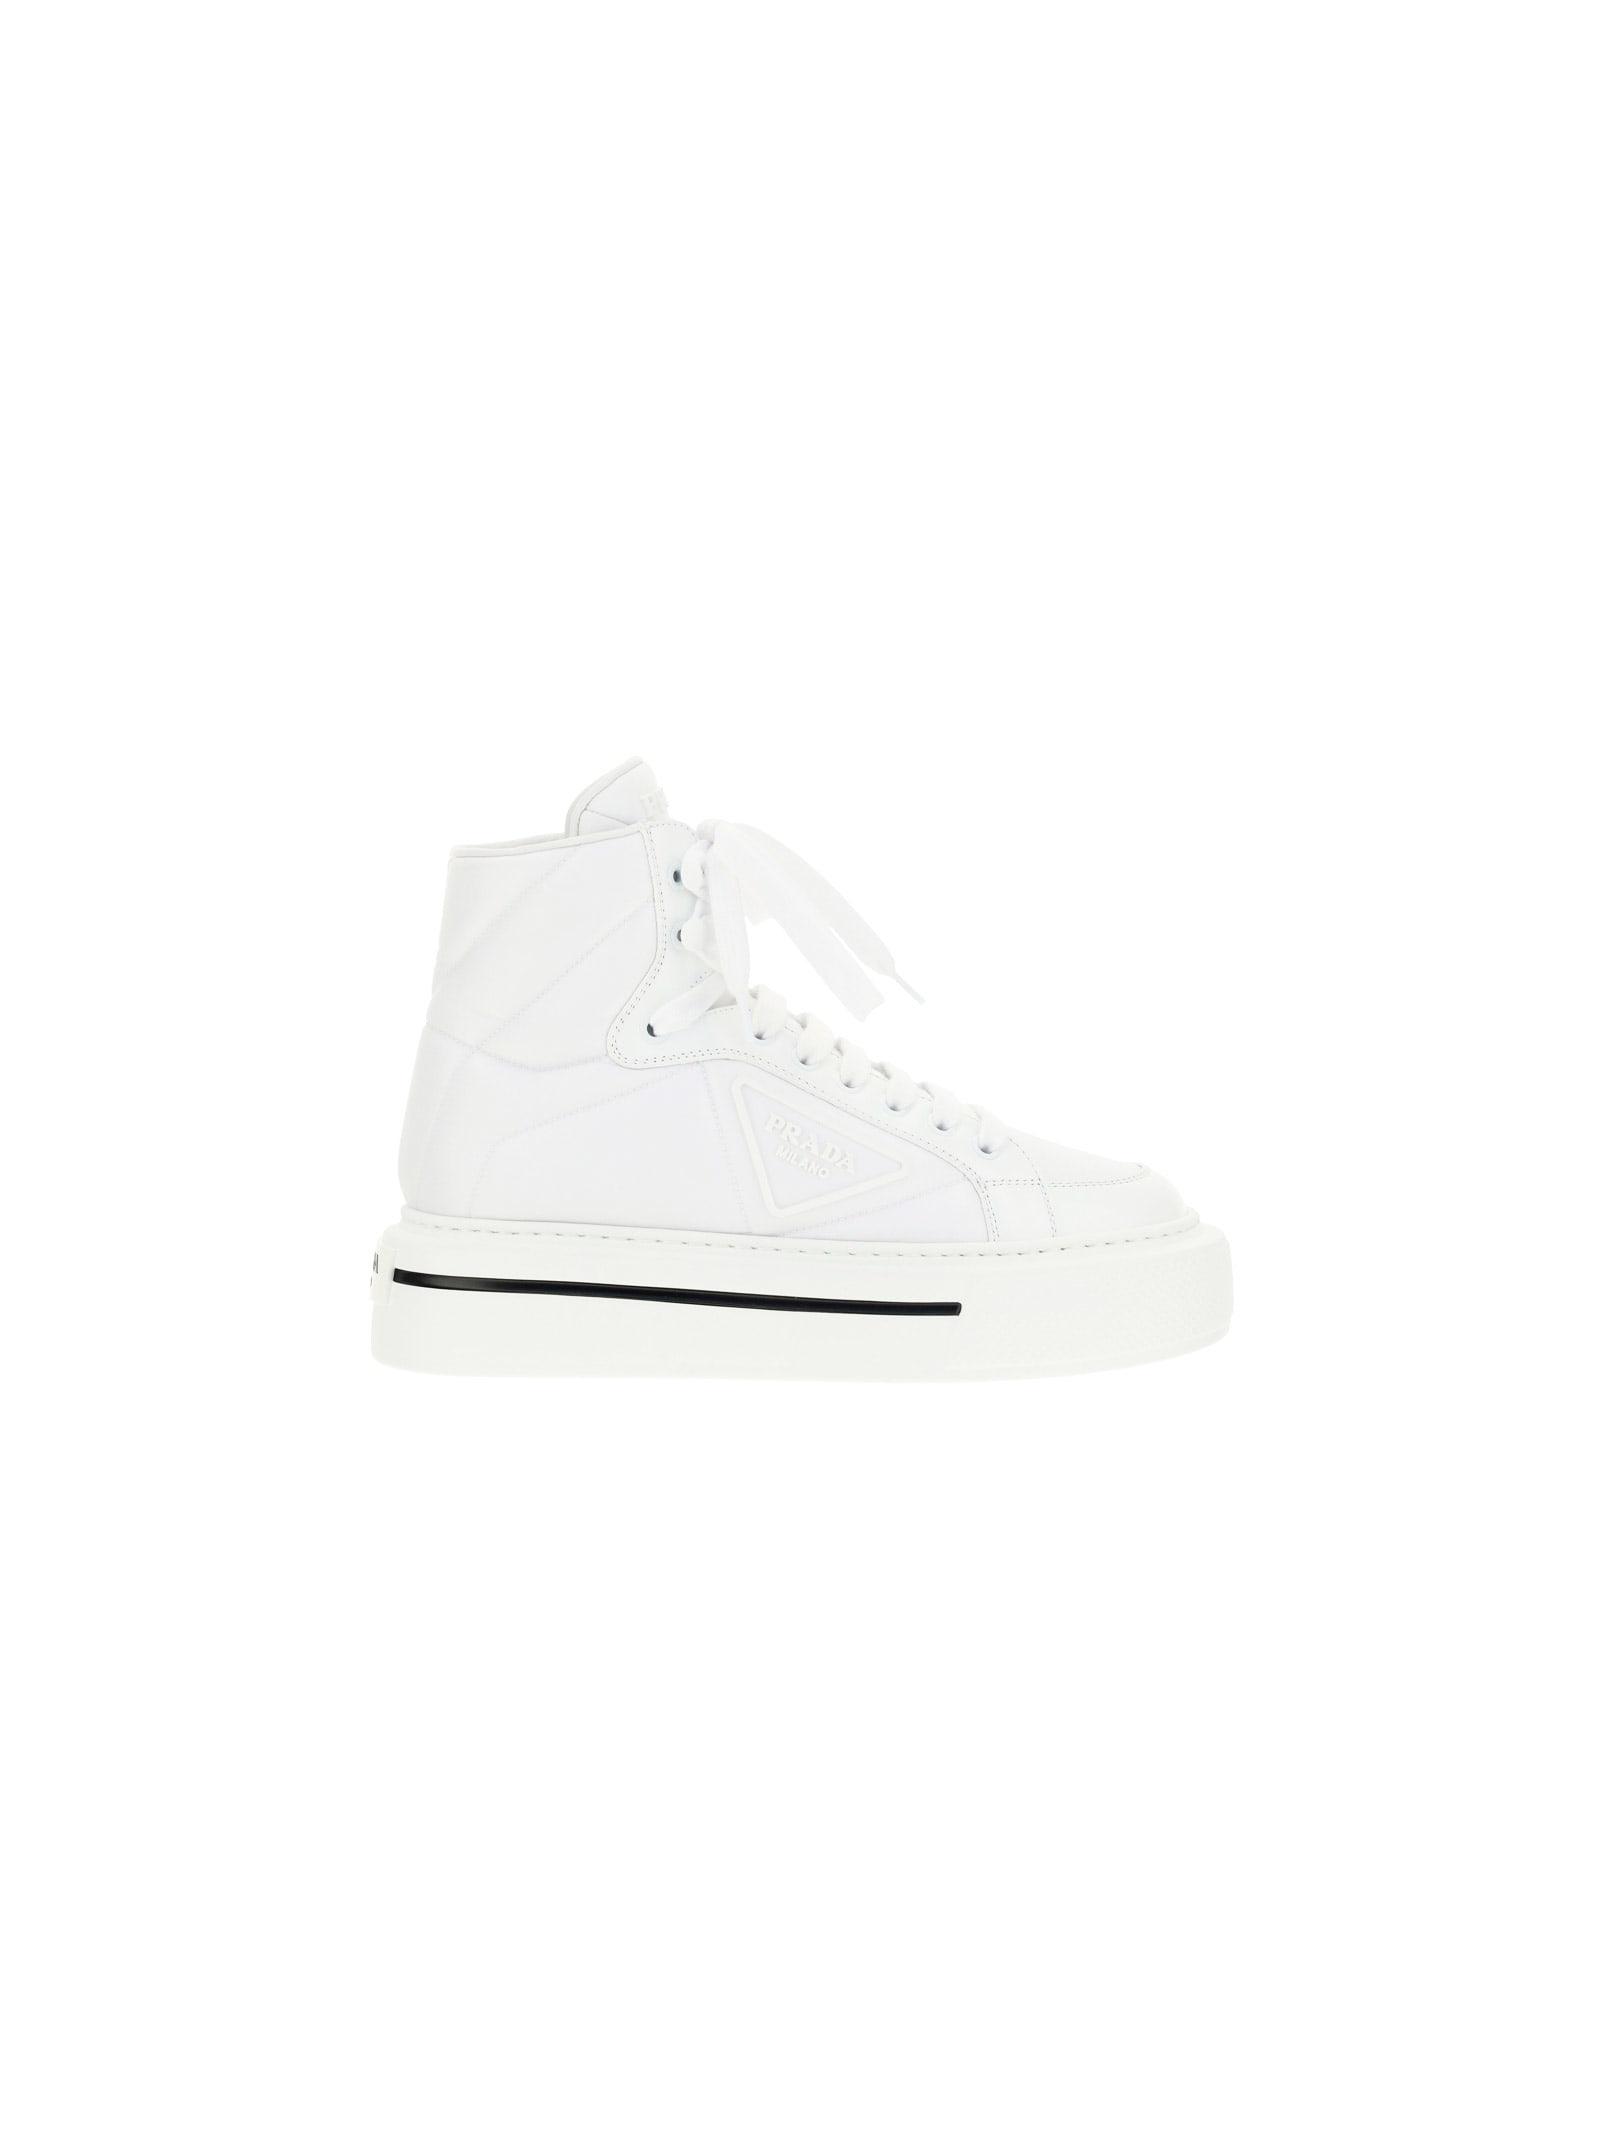 Buy Prada Macro S Sneakers online, shop Prada shoes with free shipping